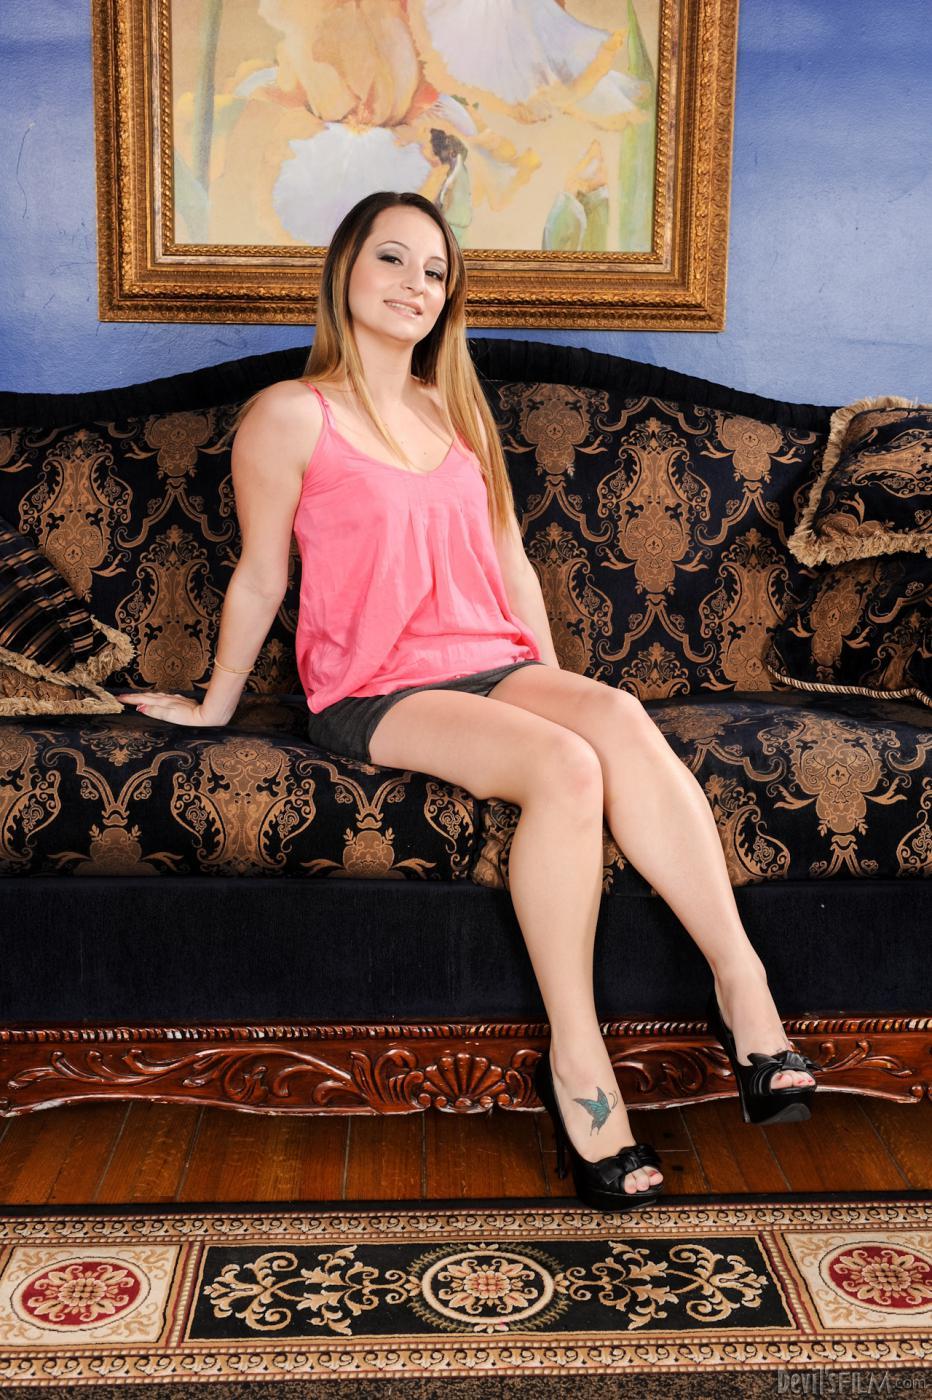 Красотка Missy Sweet снимает белье и широко растопыривает ножки